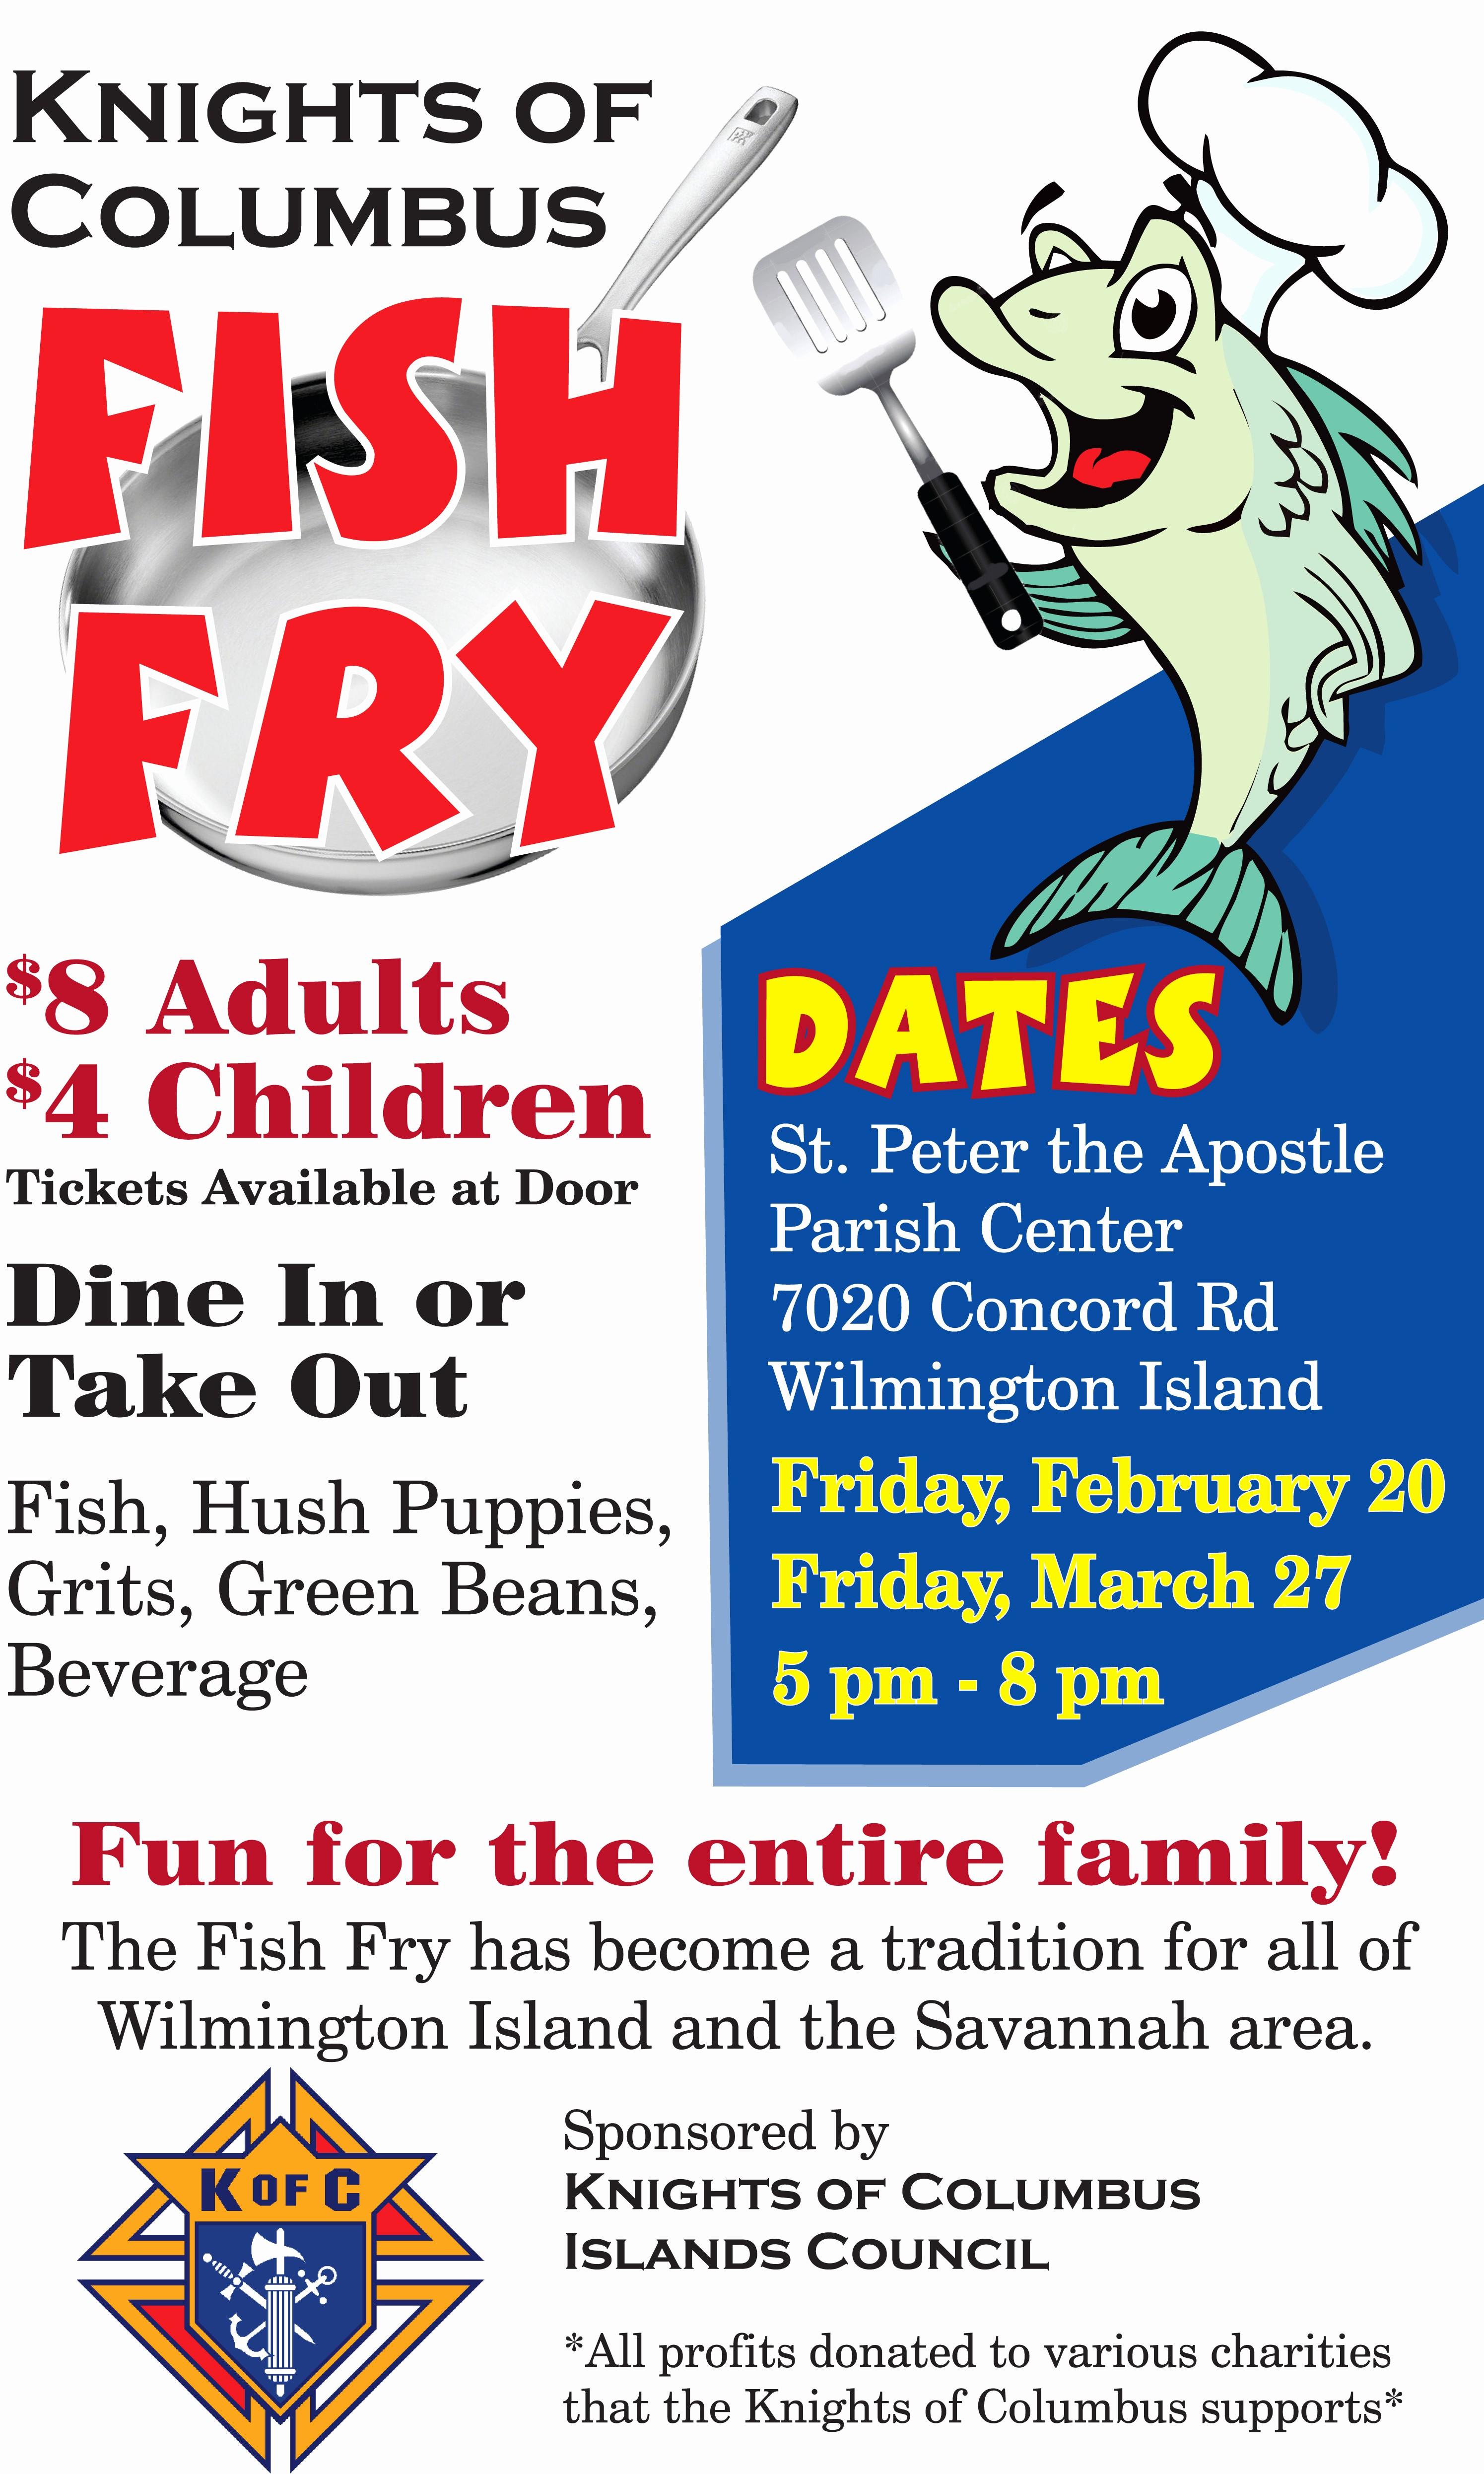 Free Fish Fry Flyer Templates Awesome K Of C Lenten Fish Fry Saint Peter the Apostle Saint